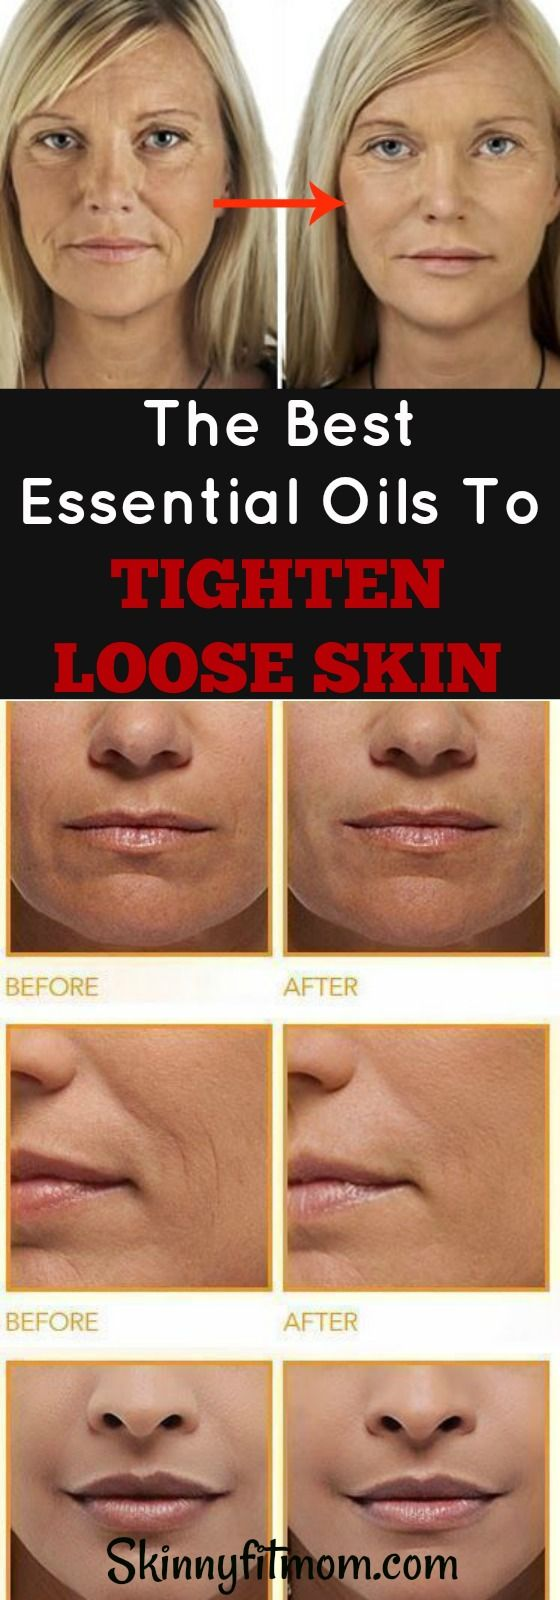 Get Rid of wrinkles and loose skin. Make your skin look years ...